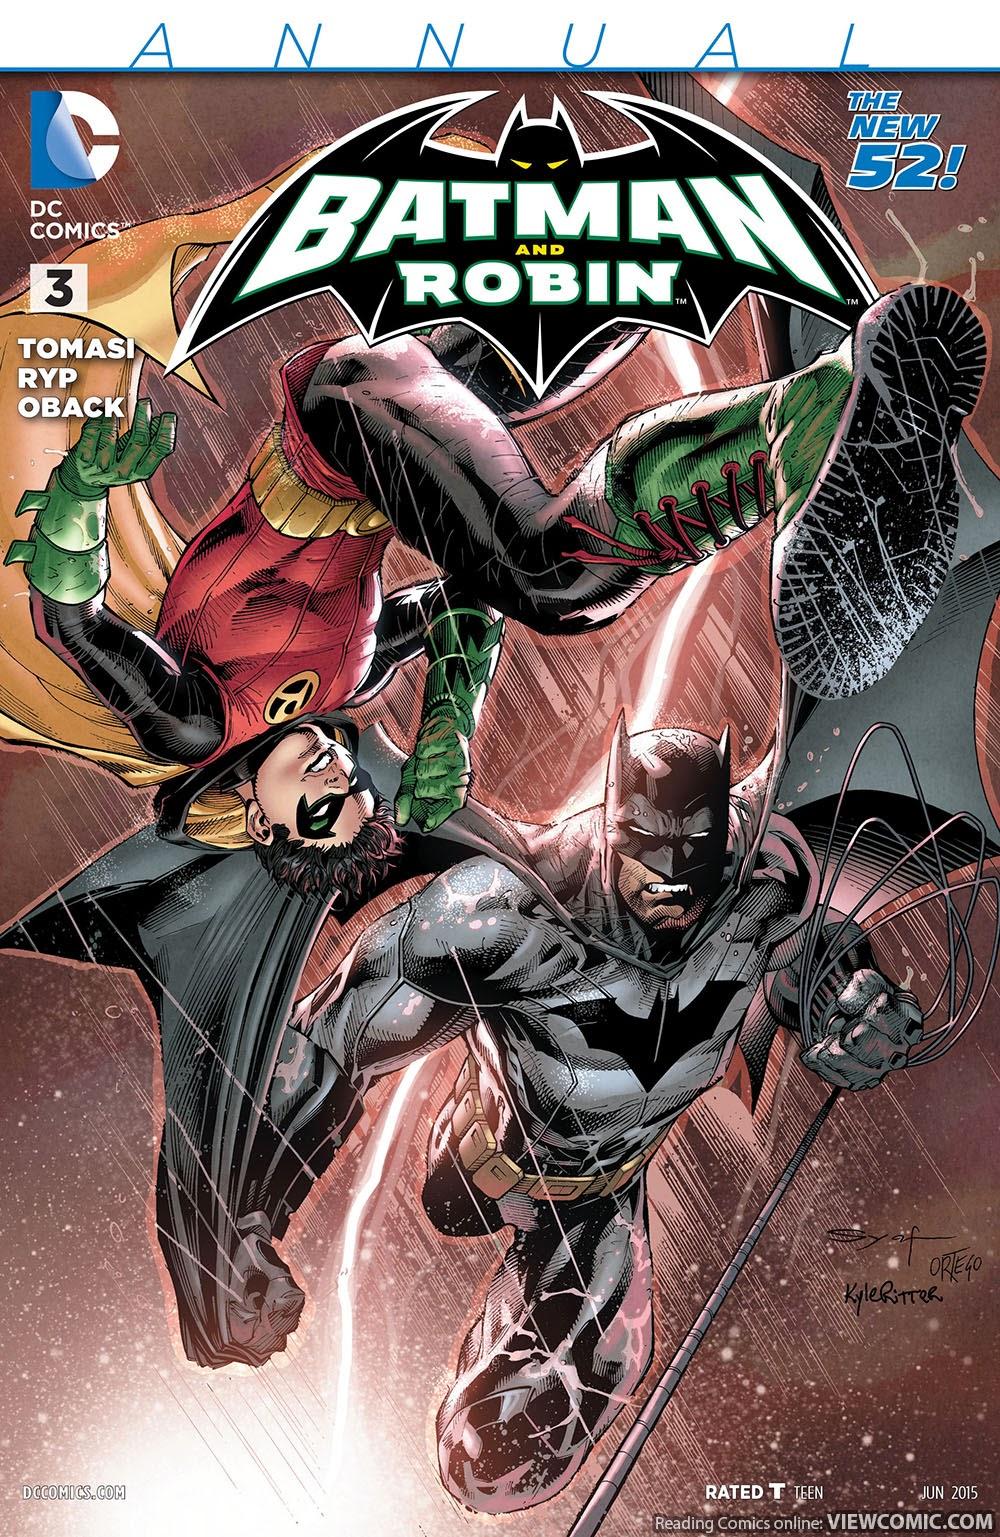 Batman And Robin Annual 003 2015 Viewcomic Reading Comics